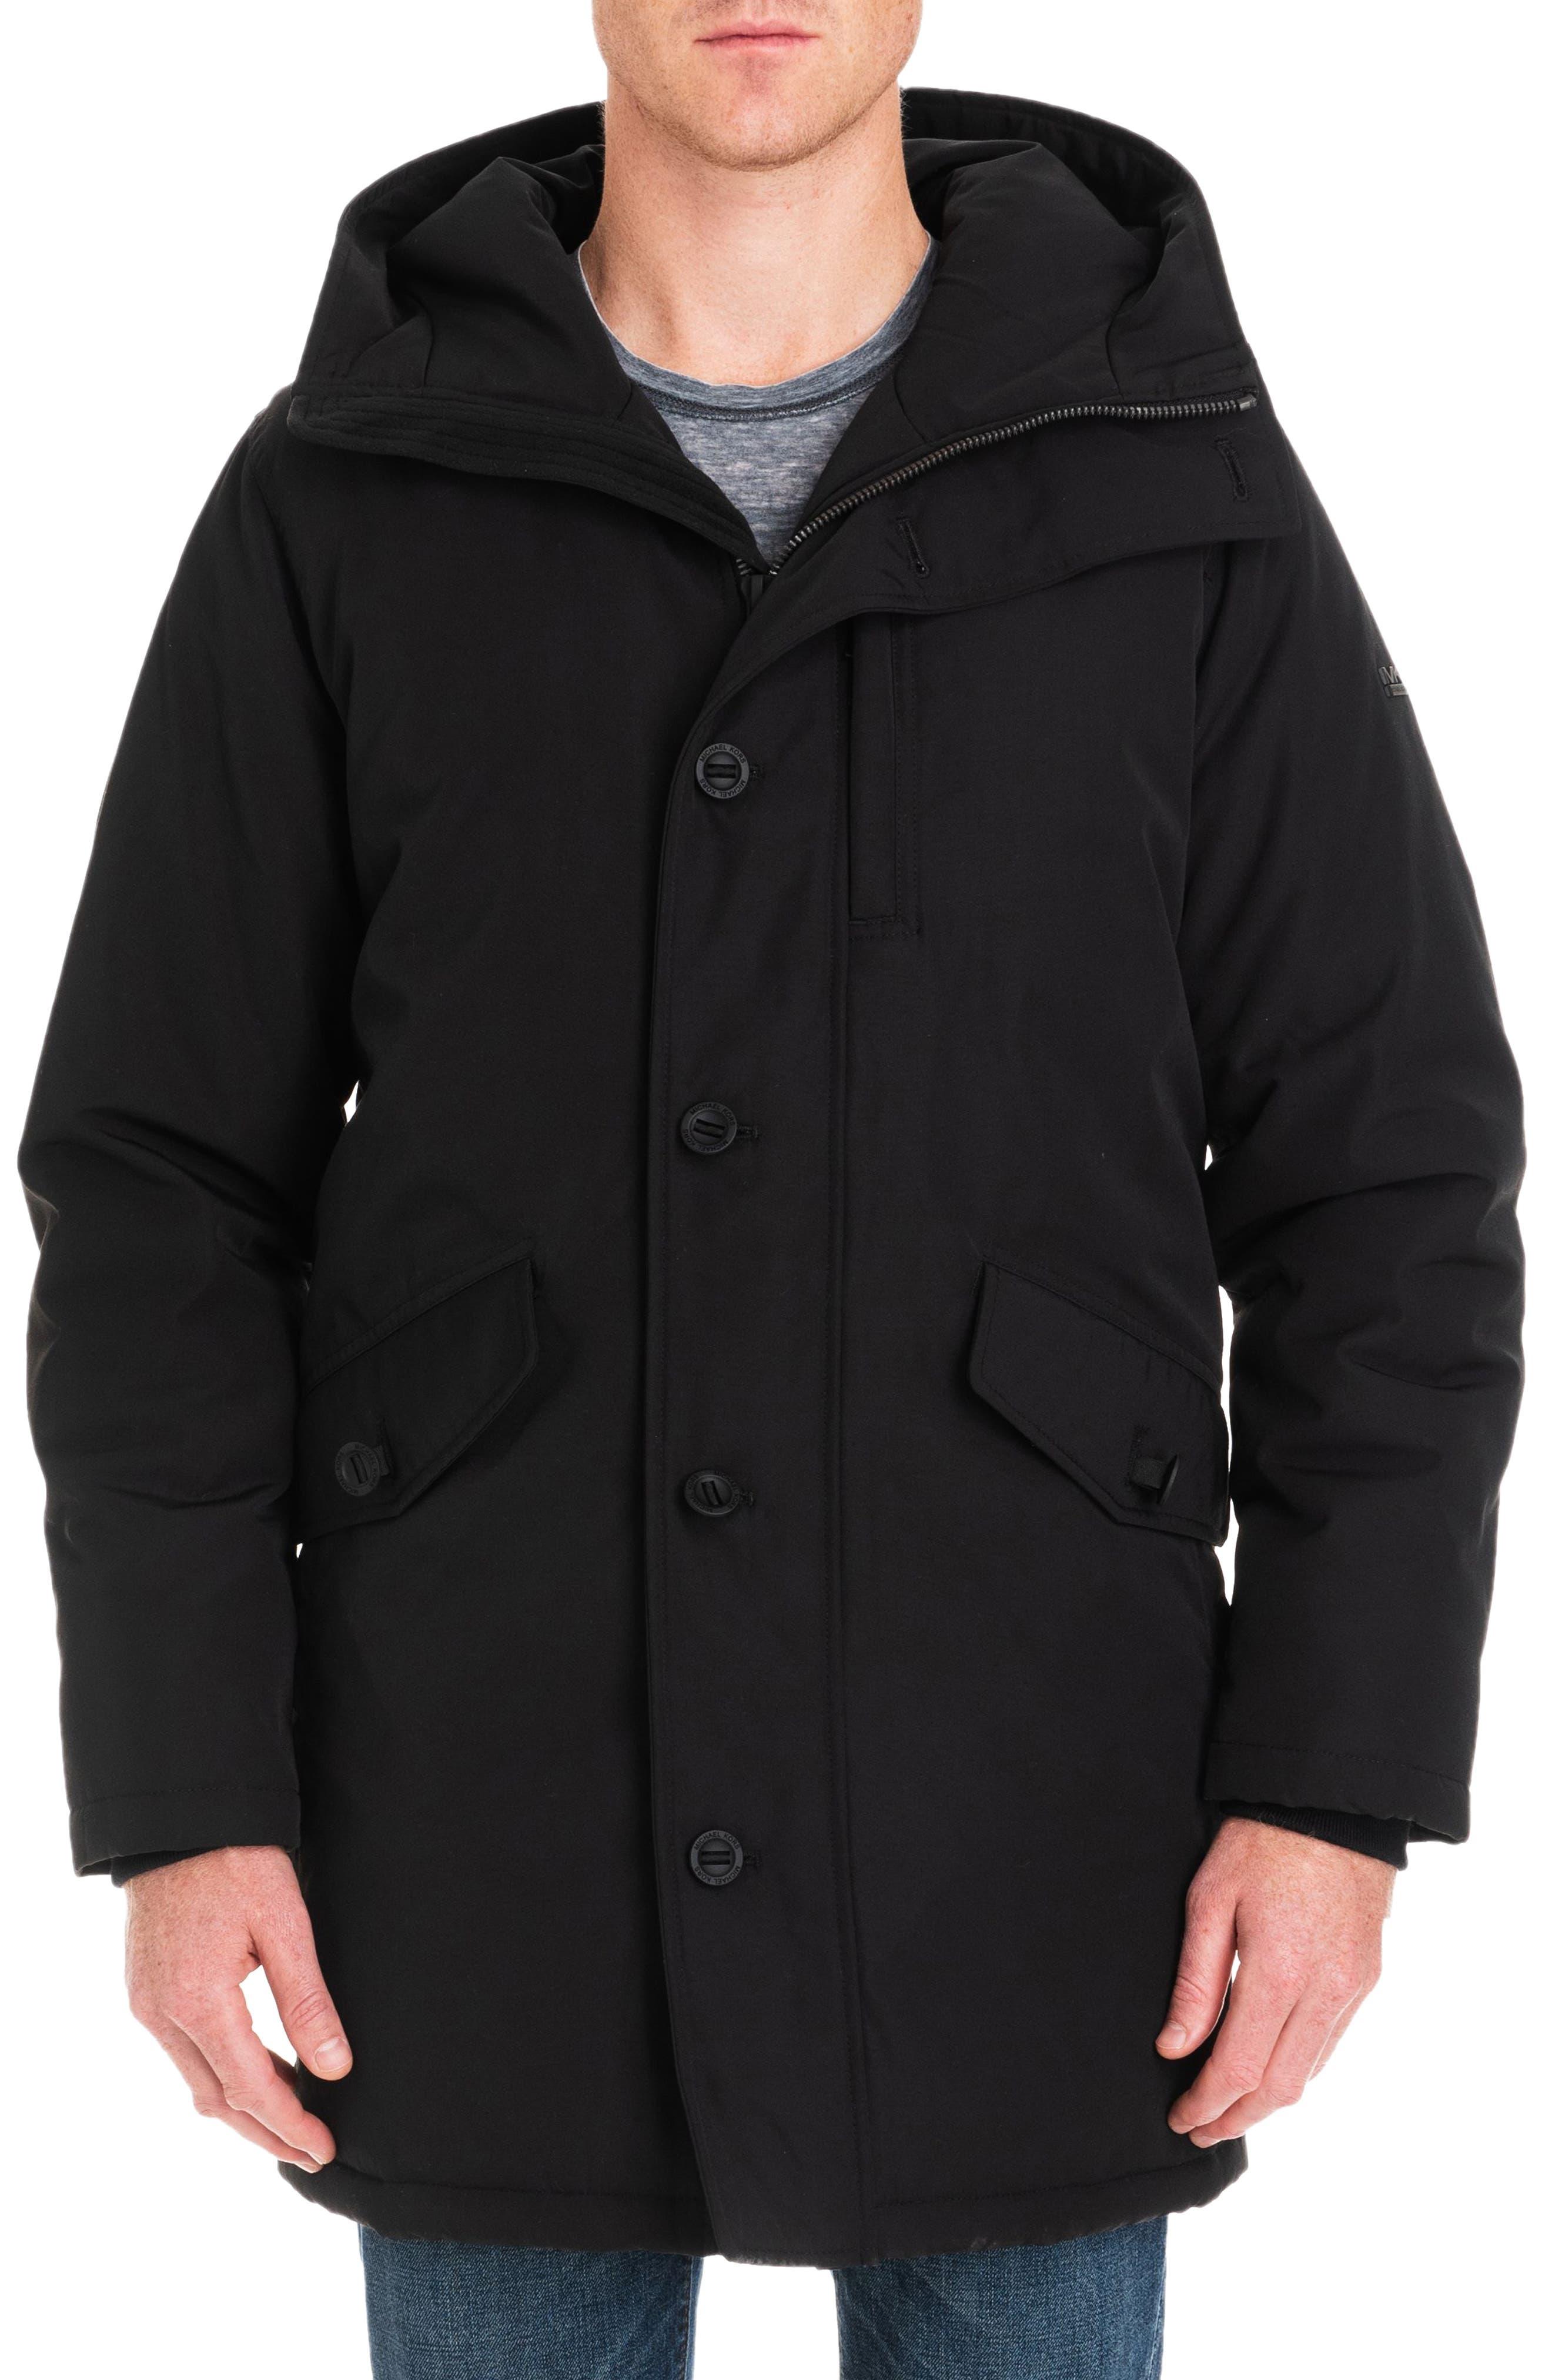 Gardiner Water Resistant Snorkel Coat,                             Main thumbnail 1, color,                             BLACK/ MIDNIGHT